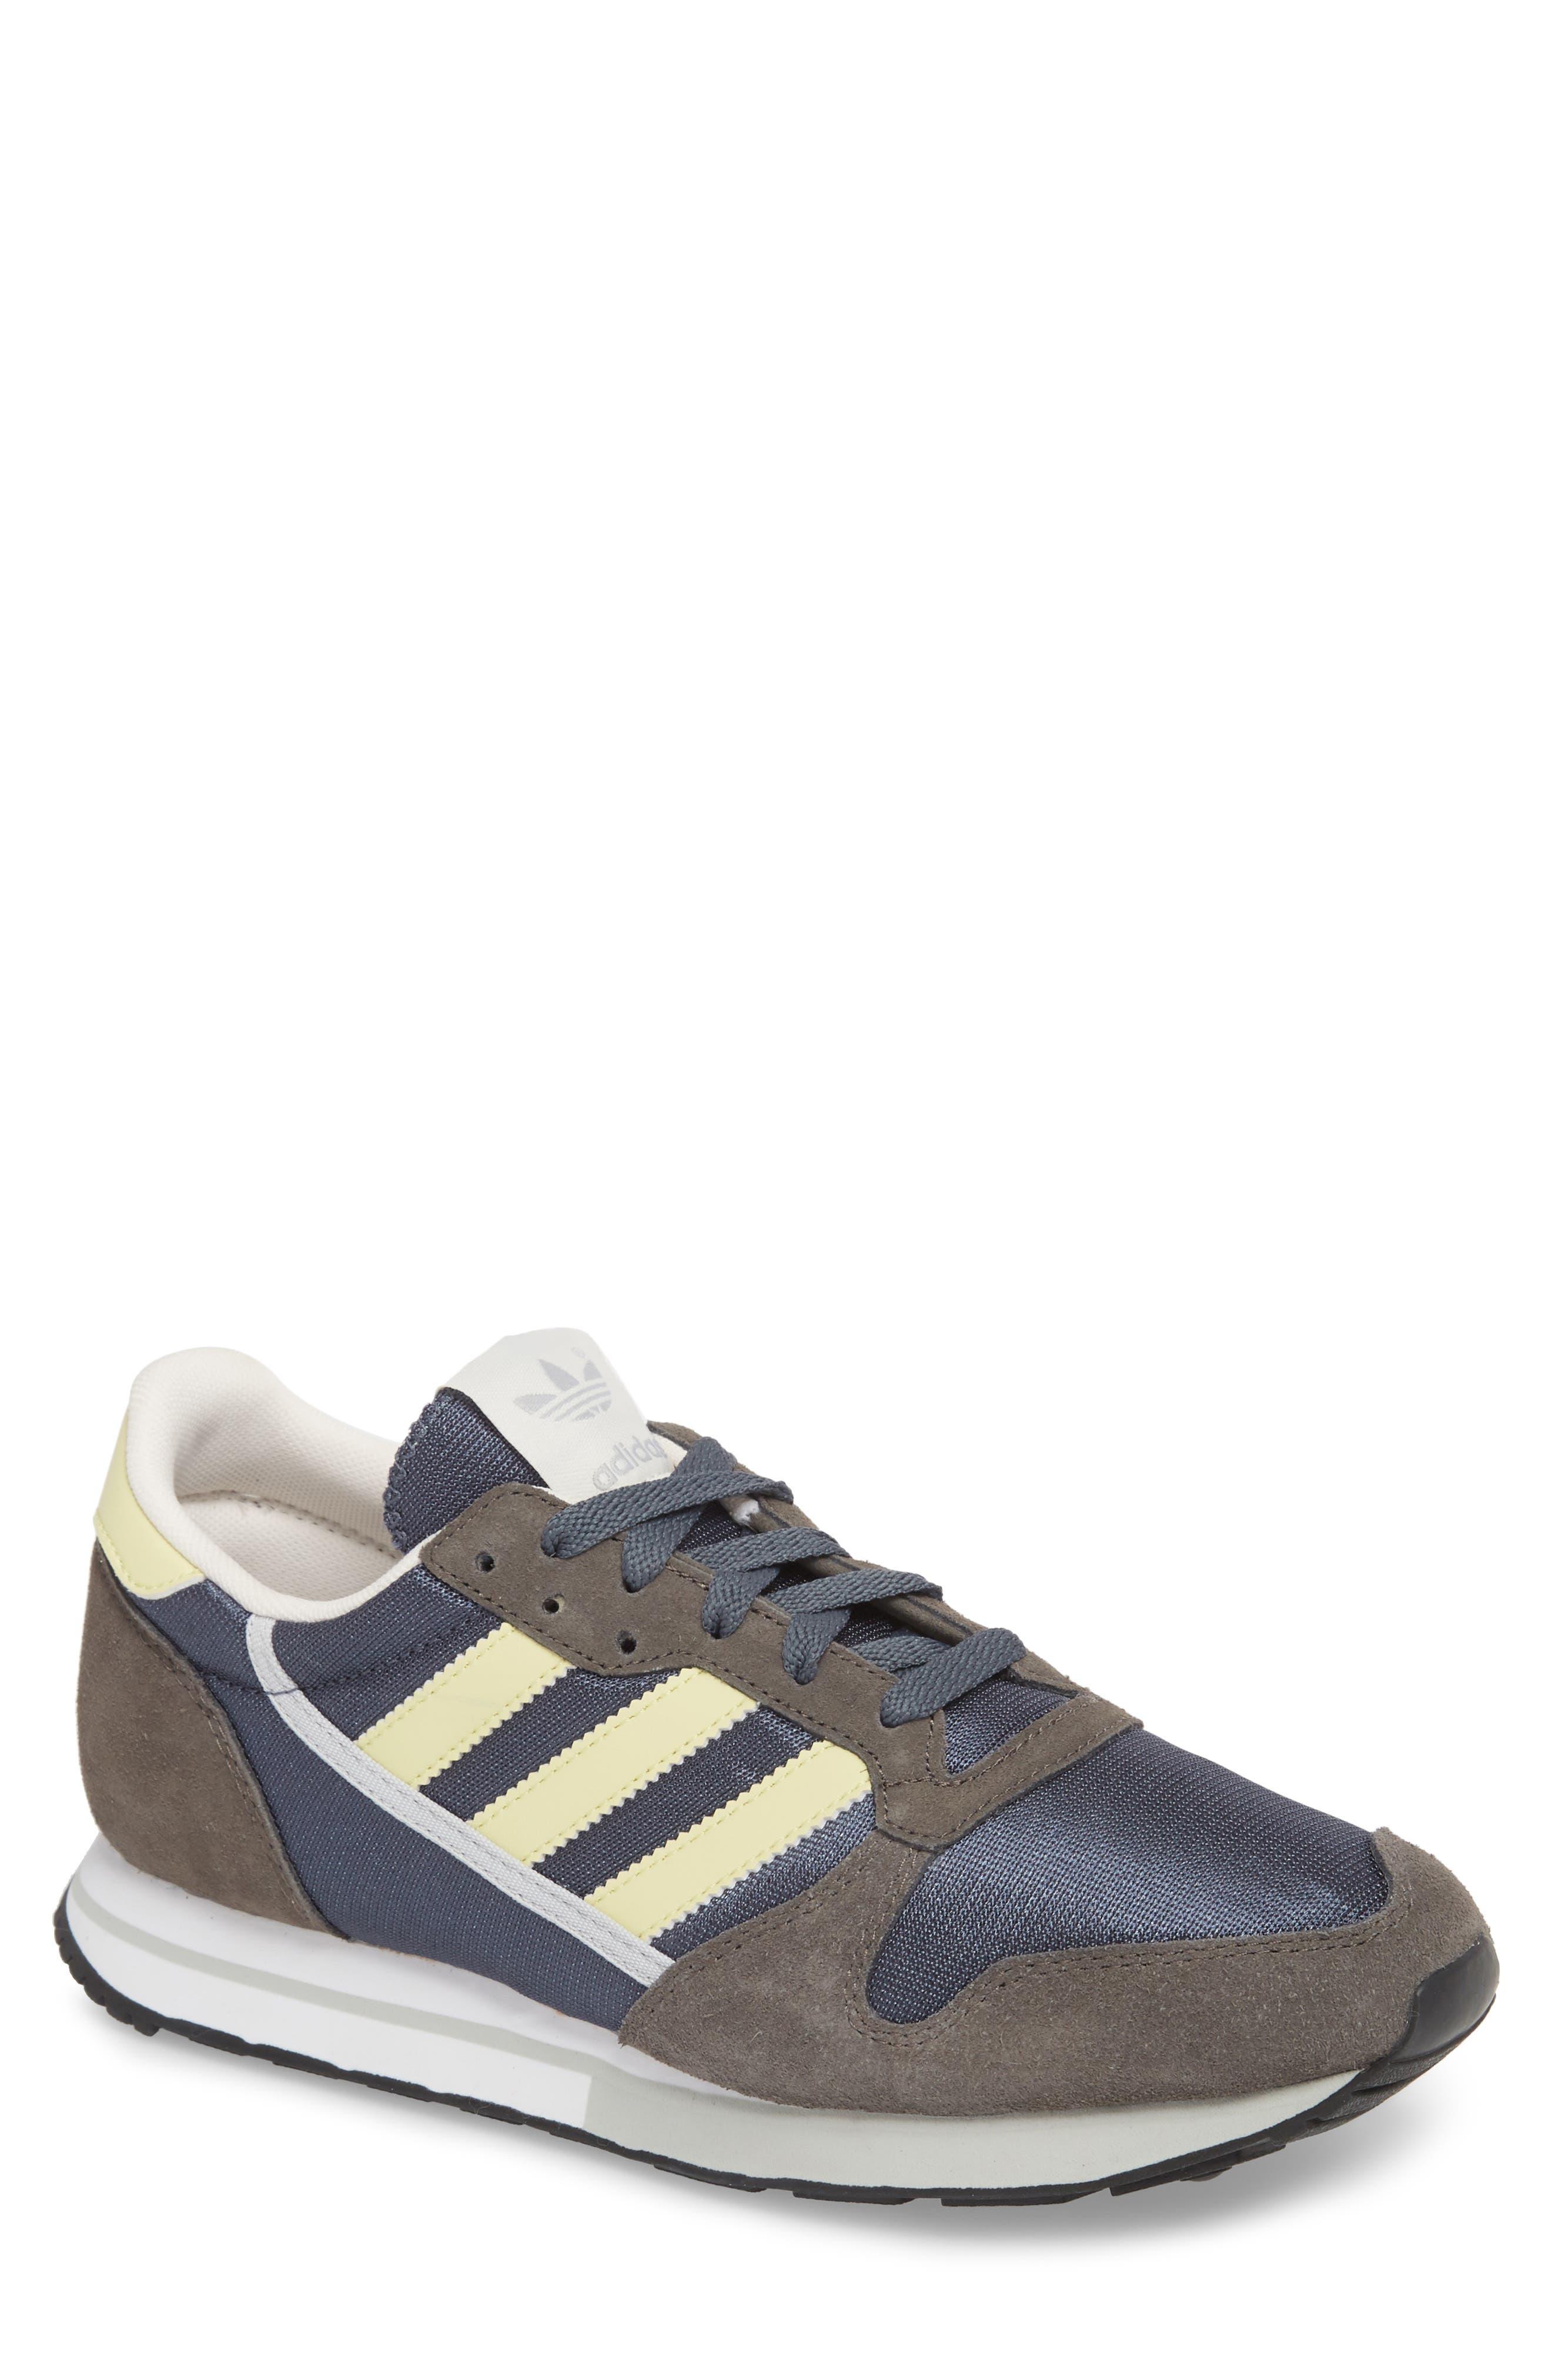 on sale 77c1e 641a2 Zapatillas de   adidas deporte adidas ZX 280 deporte SPZL (Hombre)    b29001a - chancechange.online